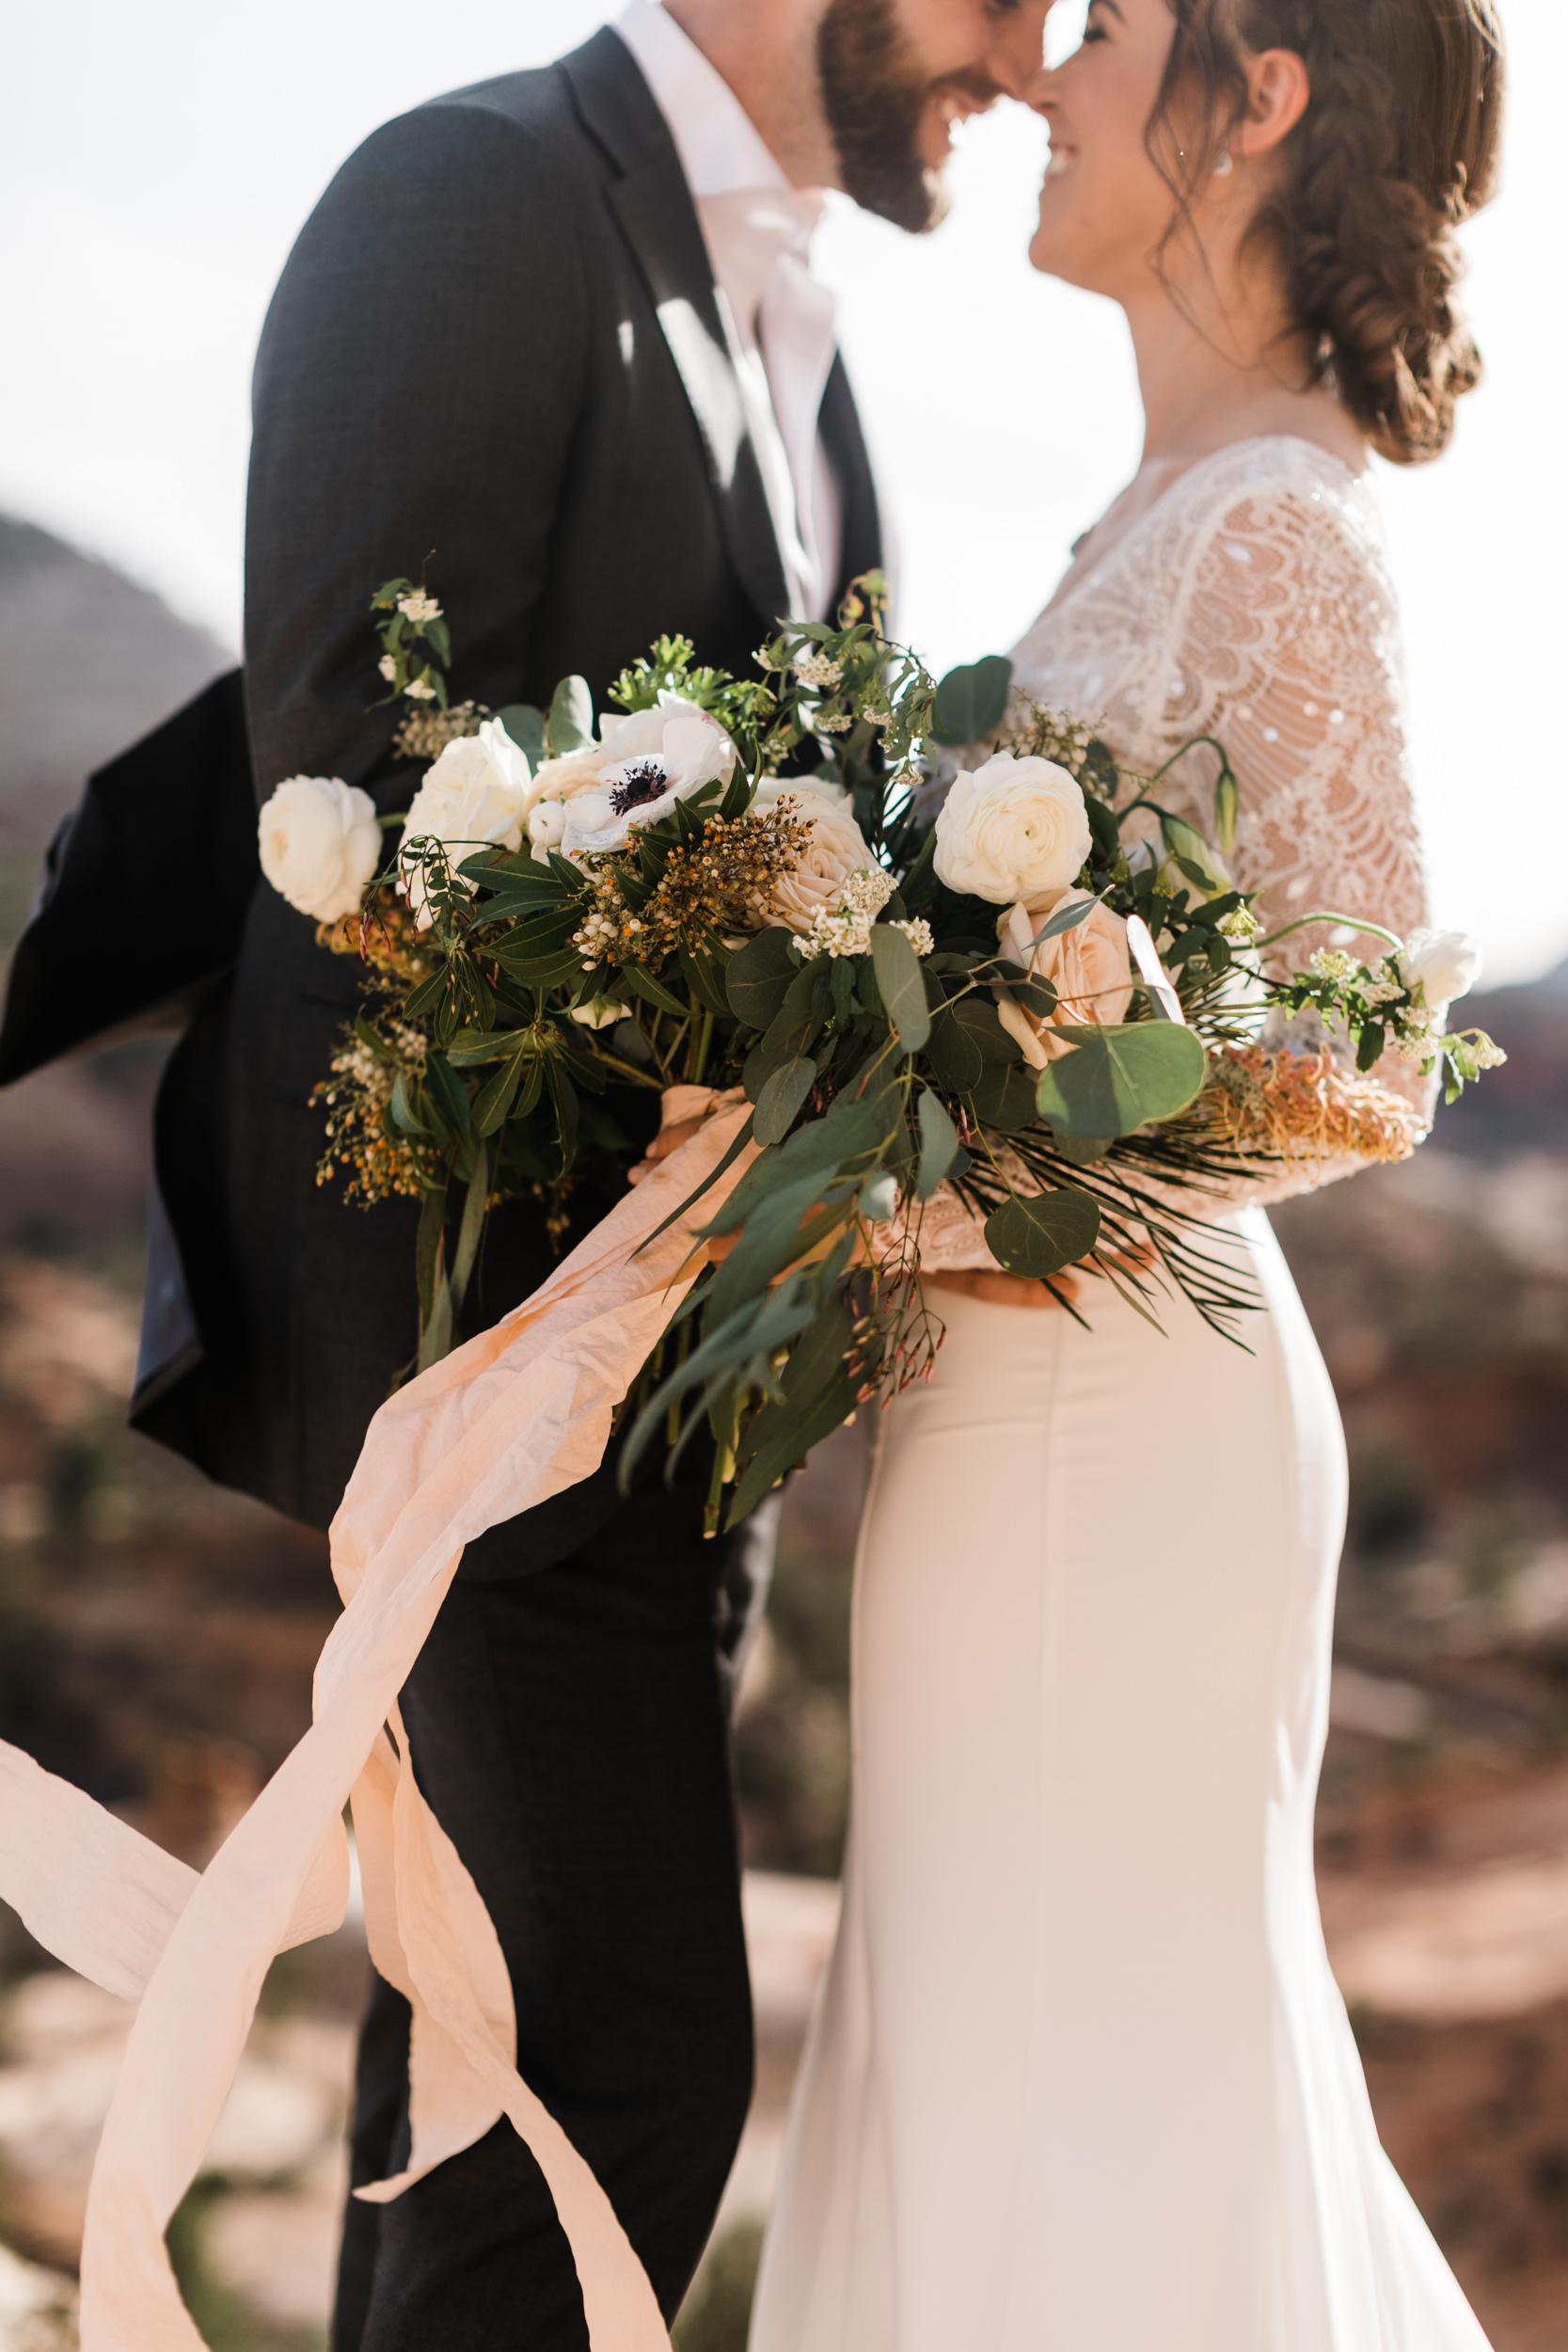 Zion-National-Park-Adventure-Wedding-Hearnes-Elopement-Photography-33.jpg